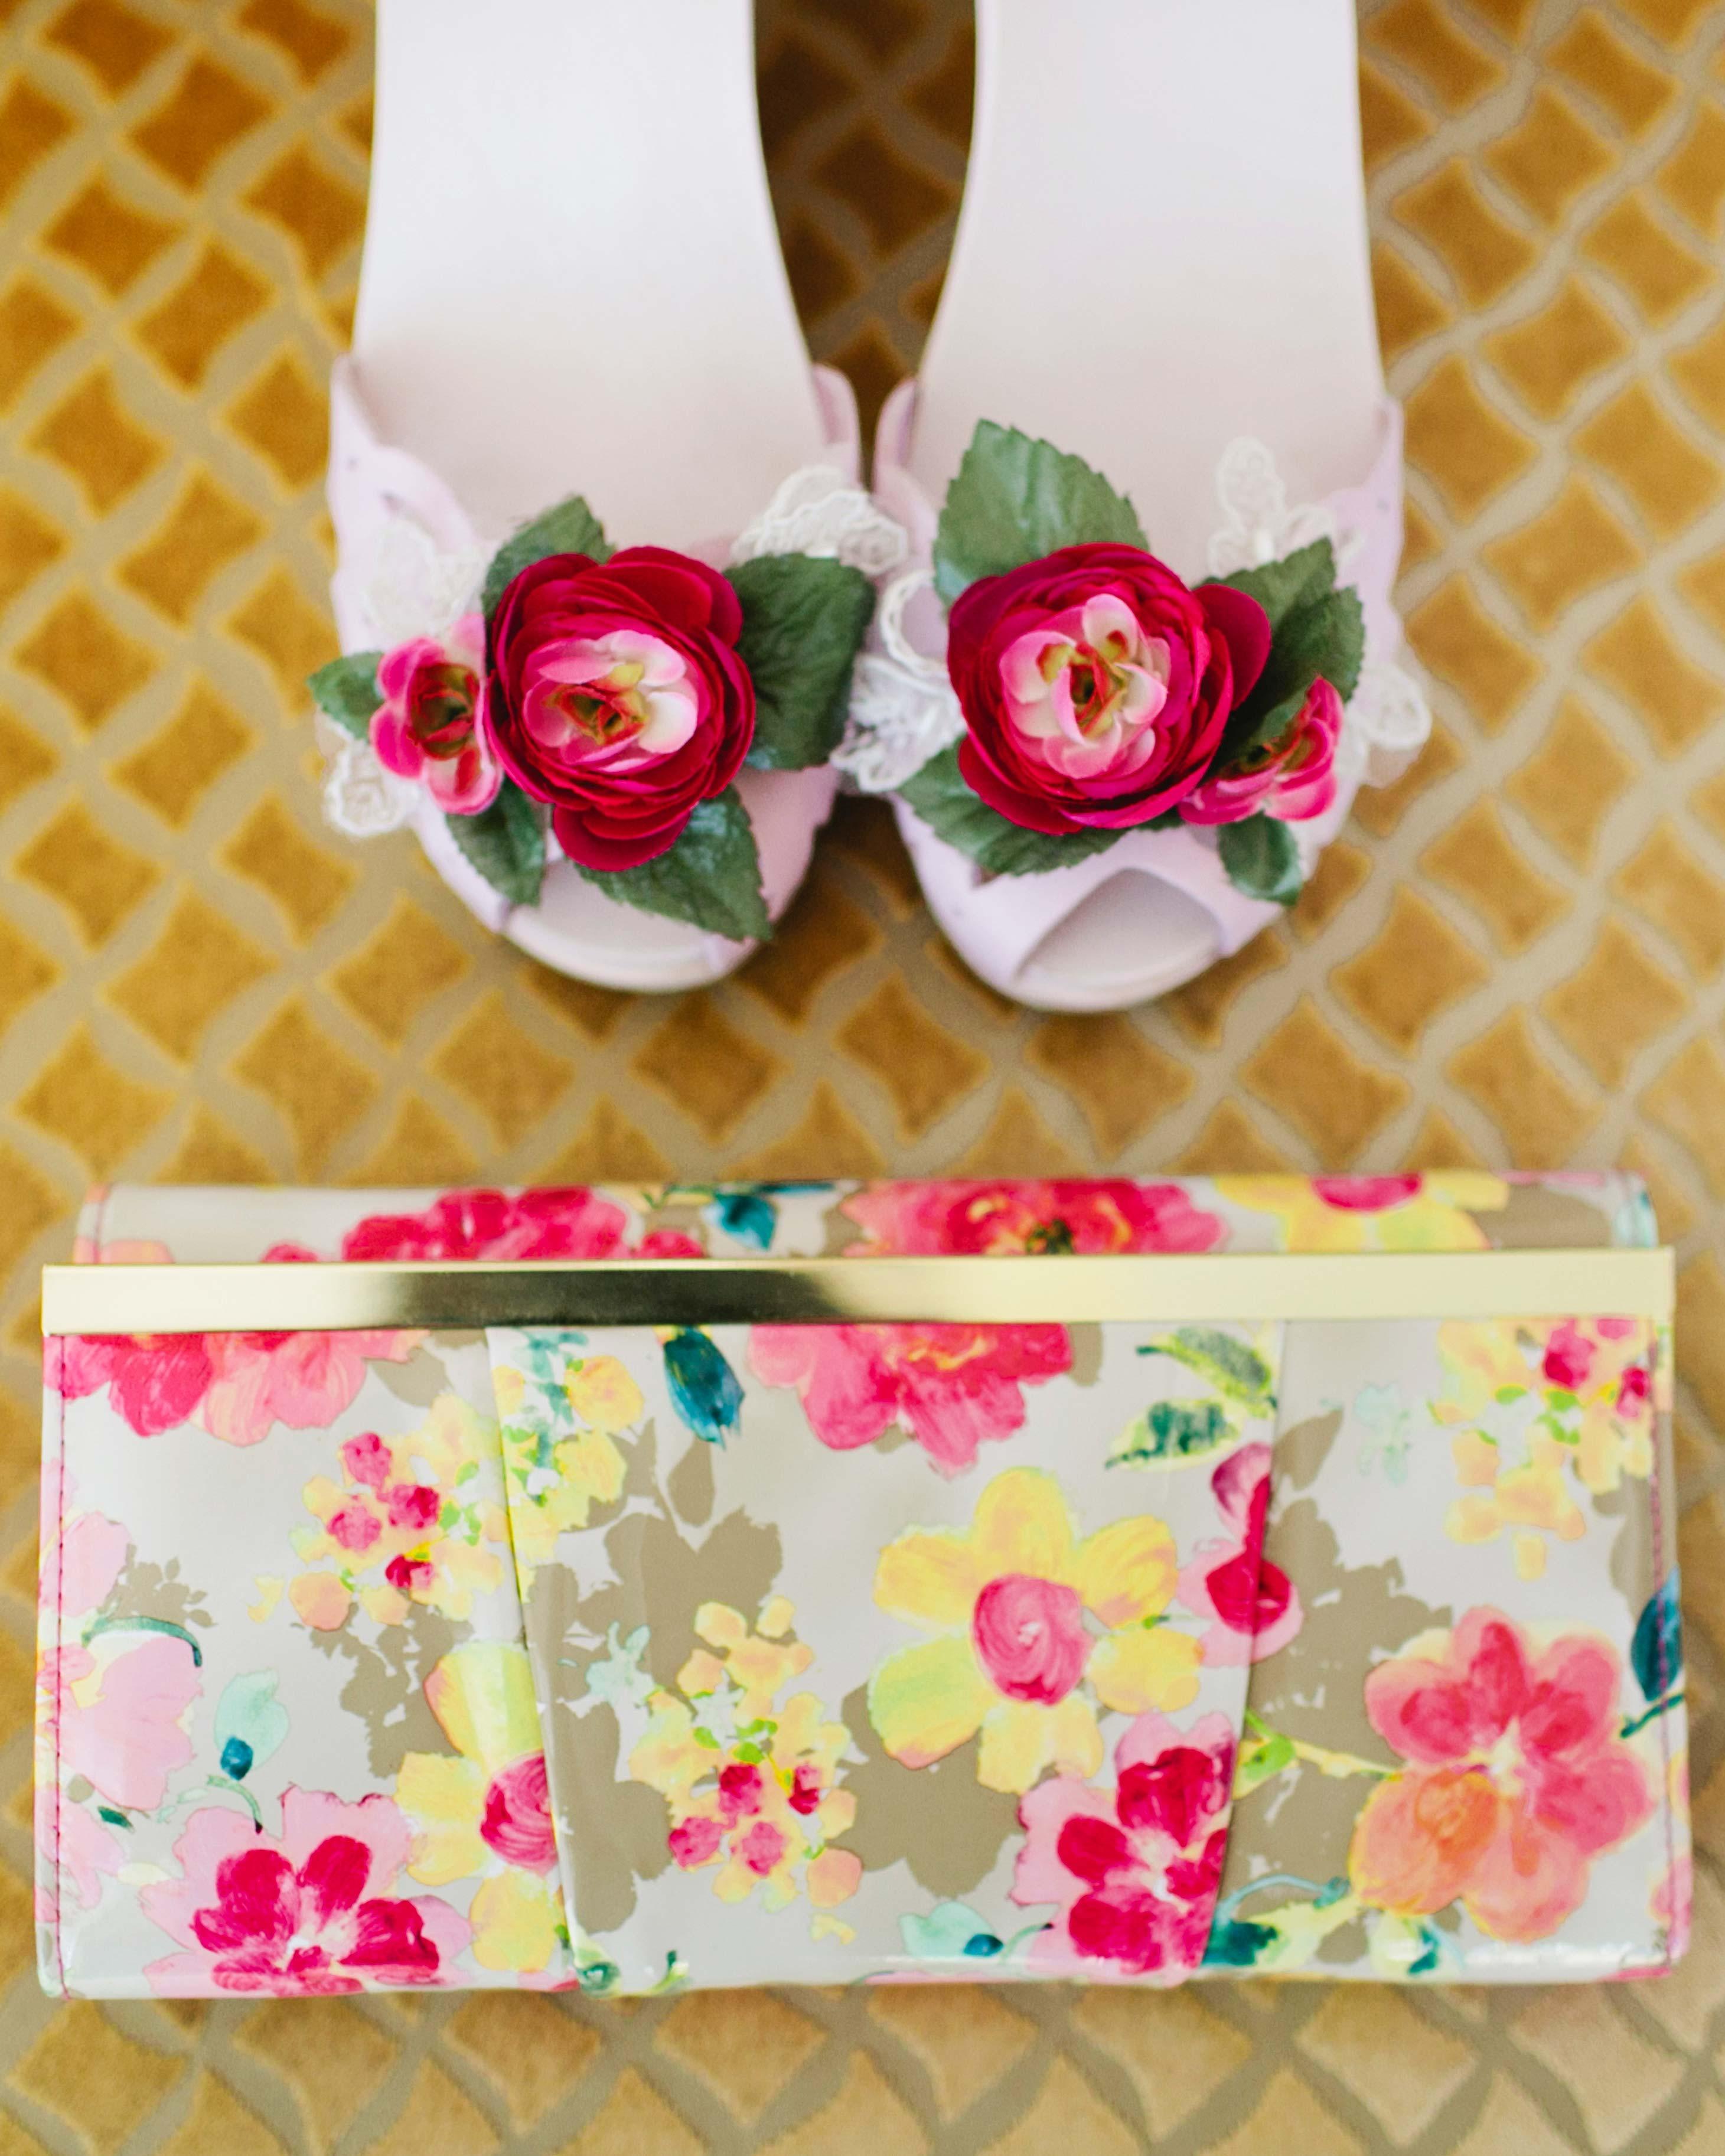 holly-john-wedding-texas-accessories-002-s112833-0516.jpg